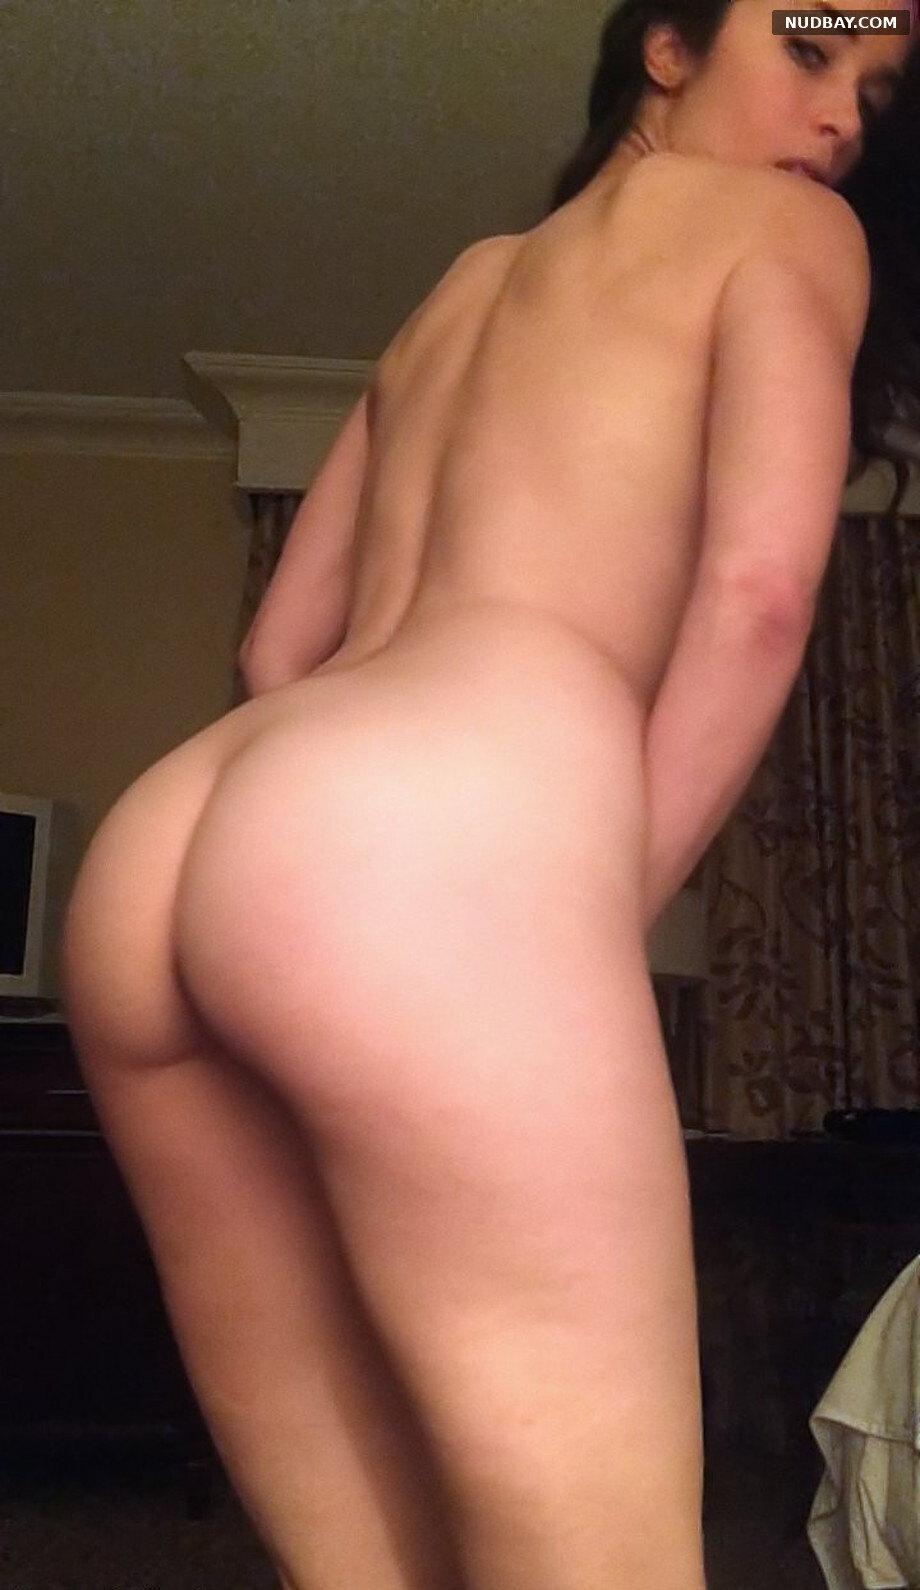 Abigail Spencer Nude Ass has fun on camera 2021